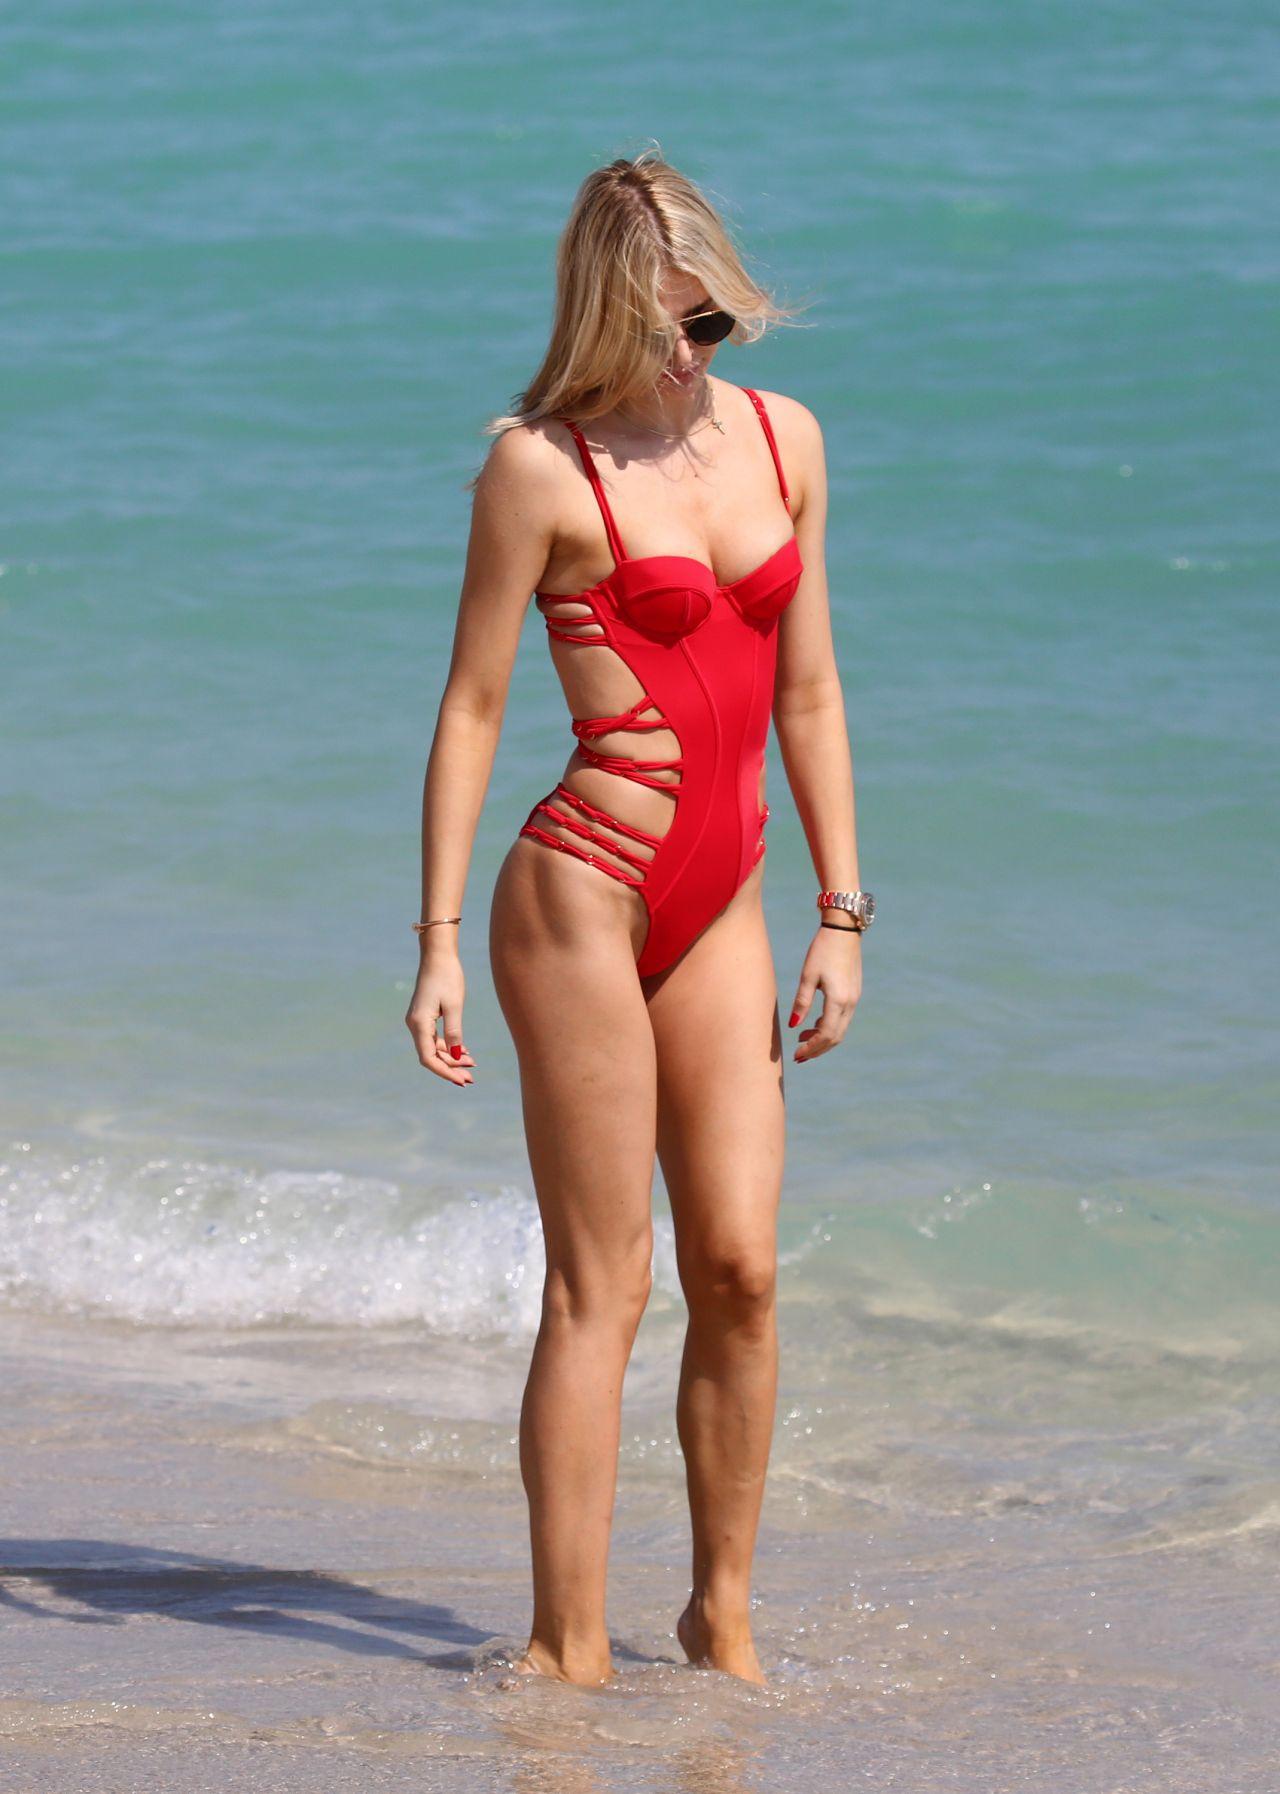 Bikini Swimsuit Sofija Milosevic  nude (46 images), Snapchat, underwear